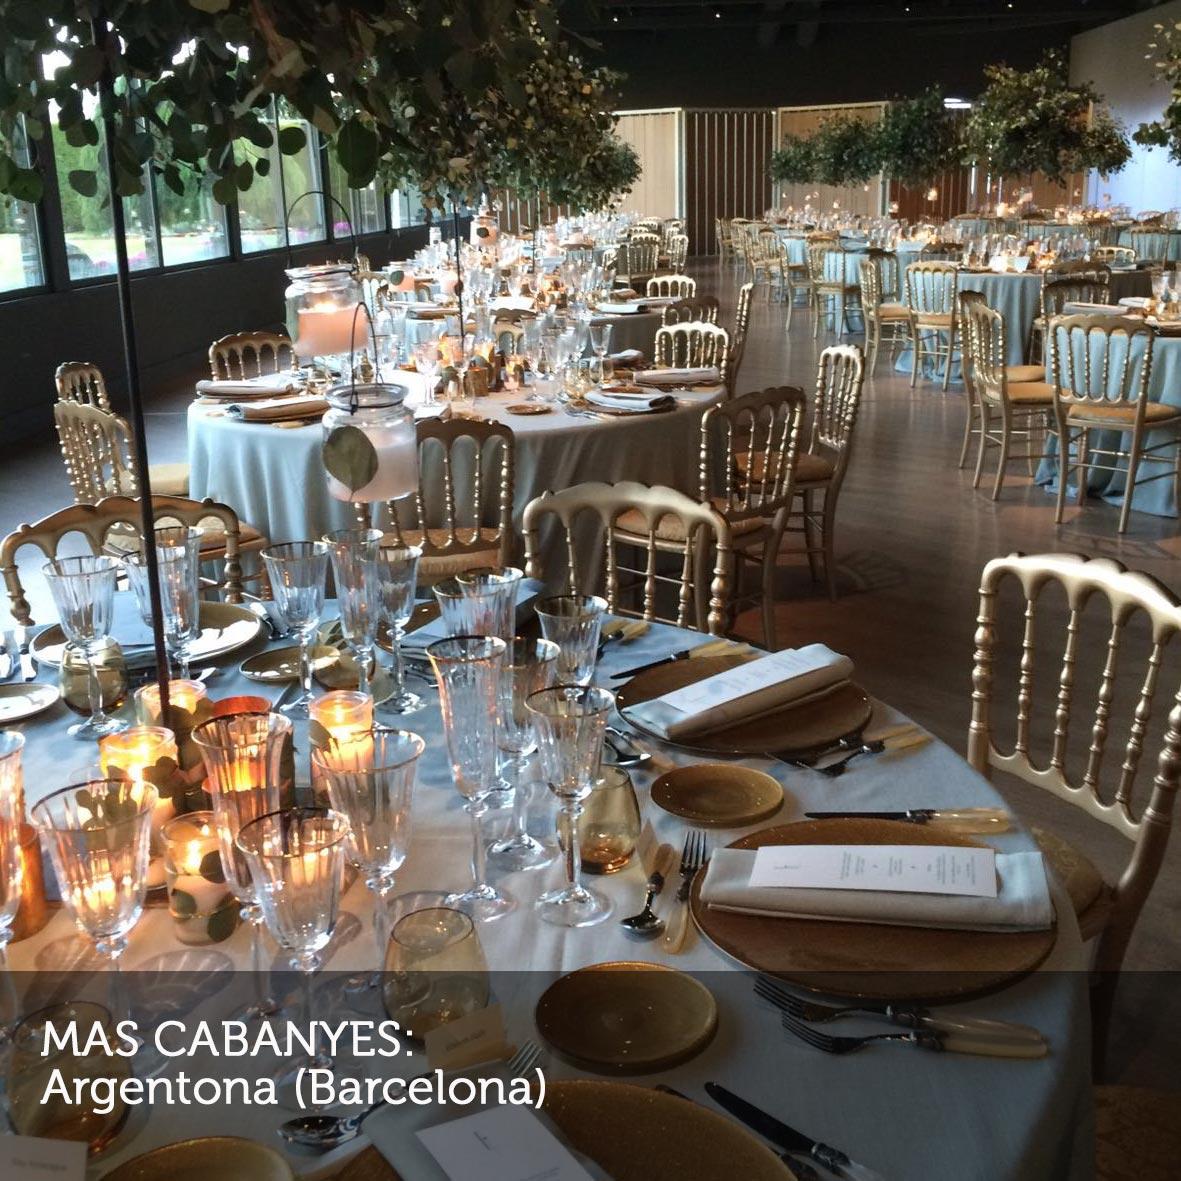 merces-events-espacios-mas-cabanyes2.jpg